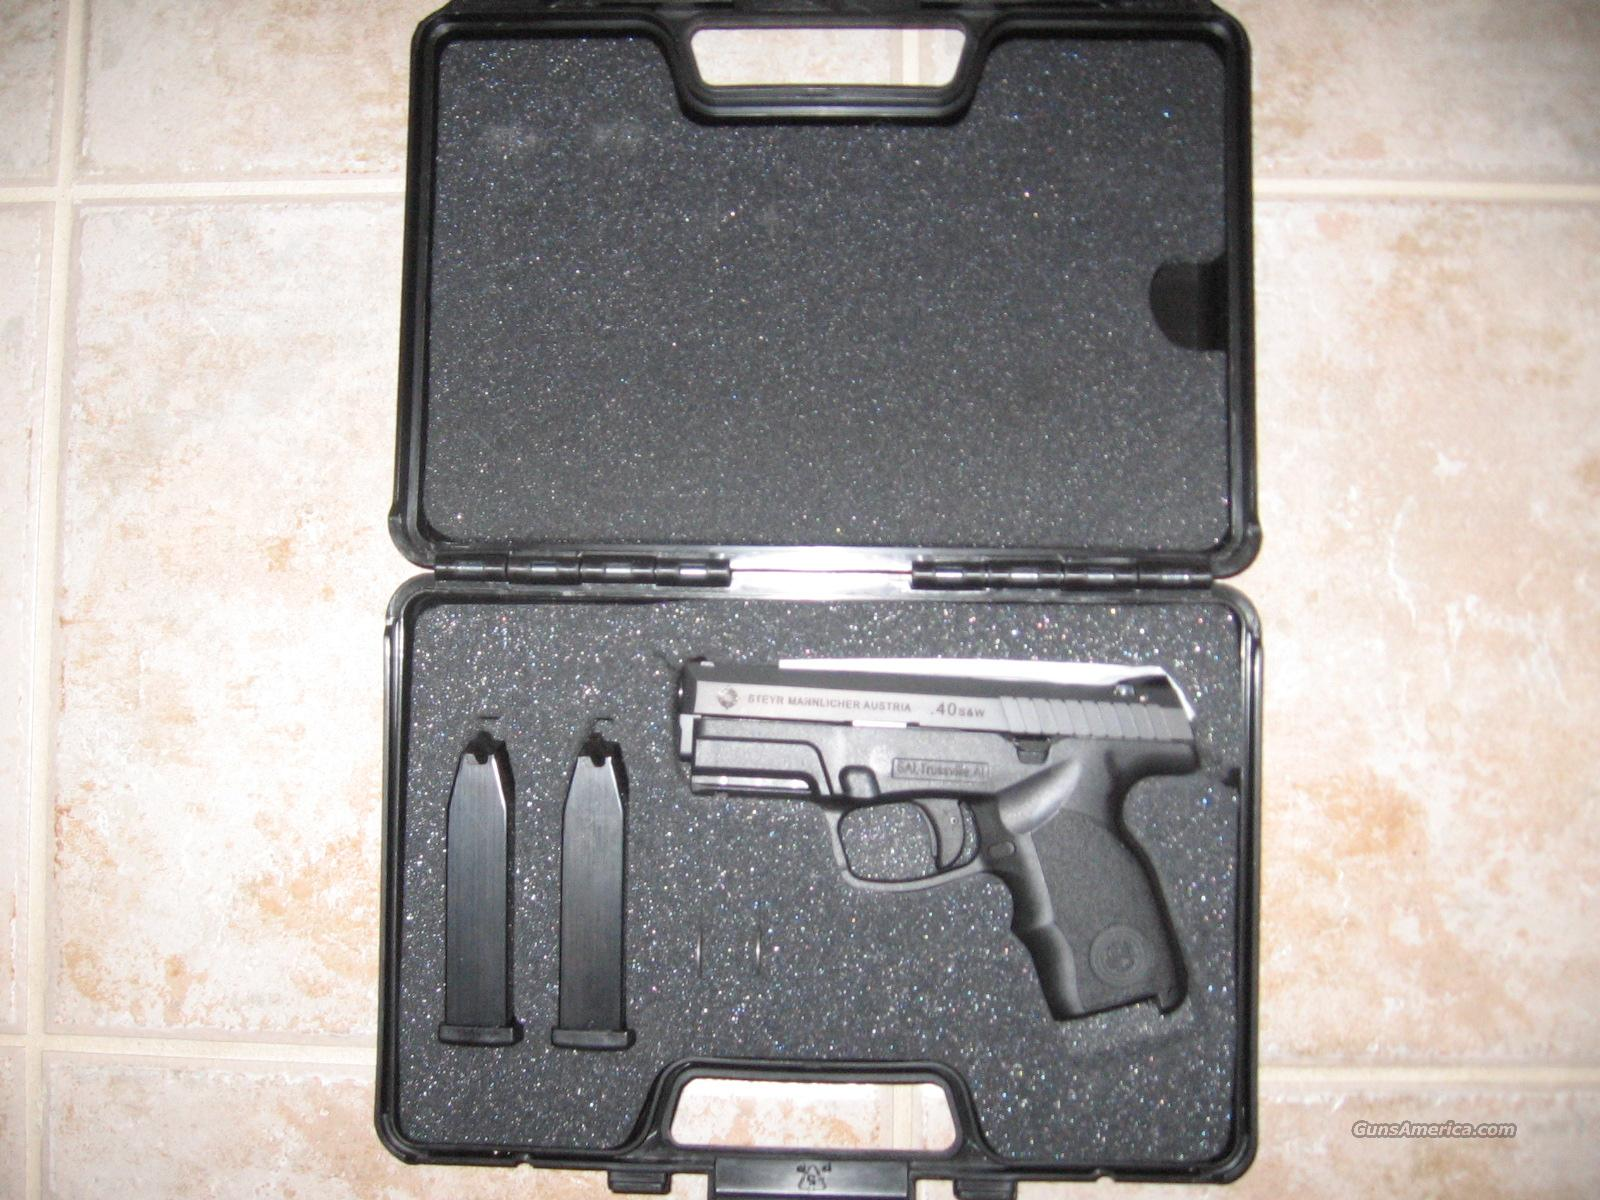 Steyr S40-A1  Guns > Pistols > Steyr Pistols